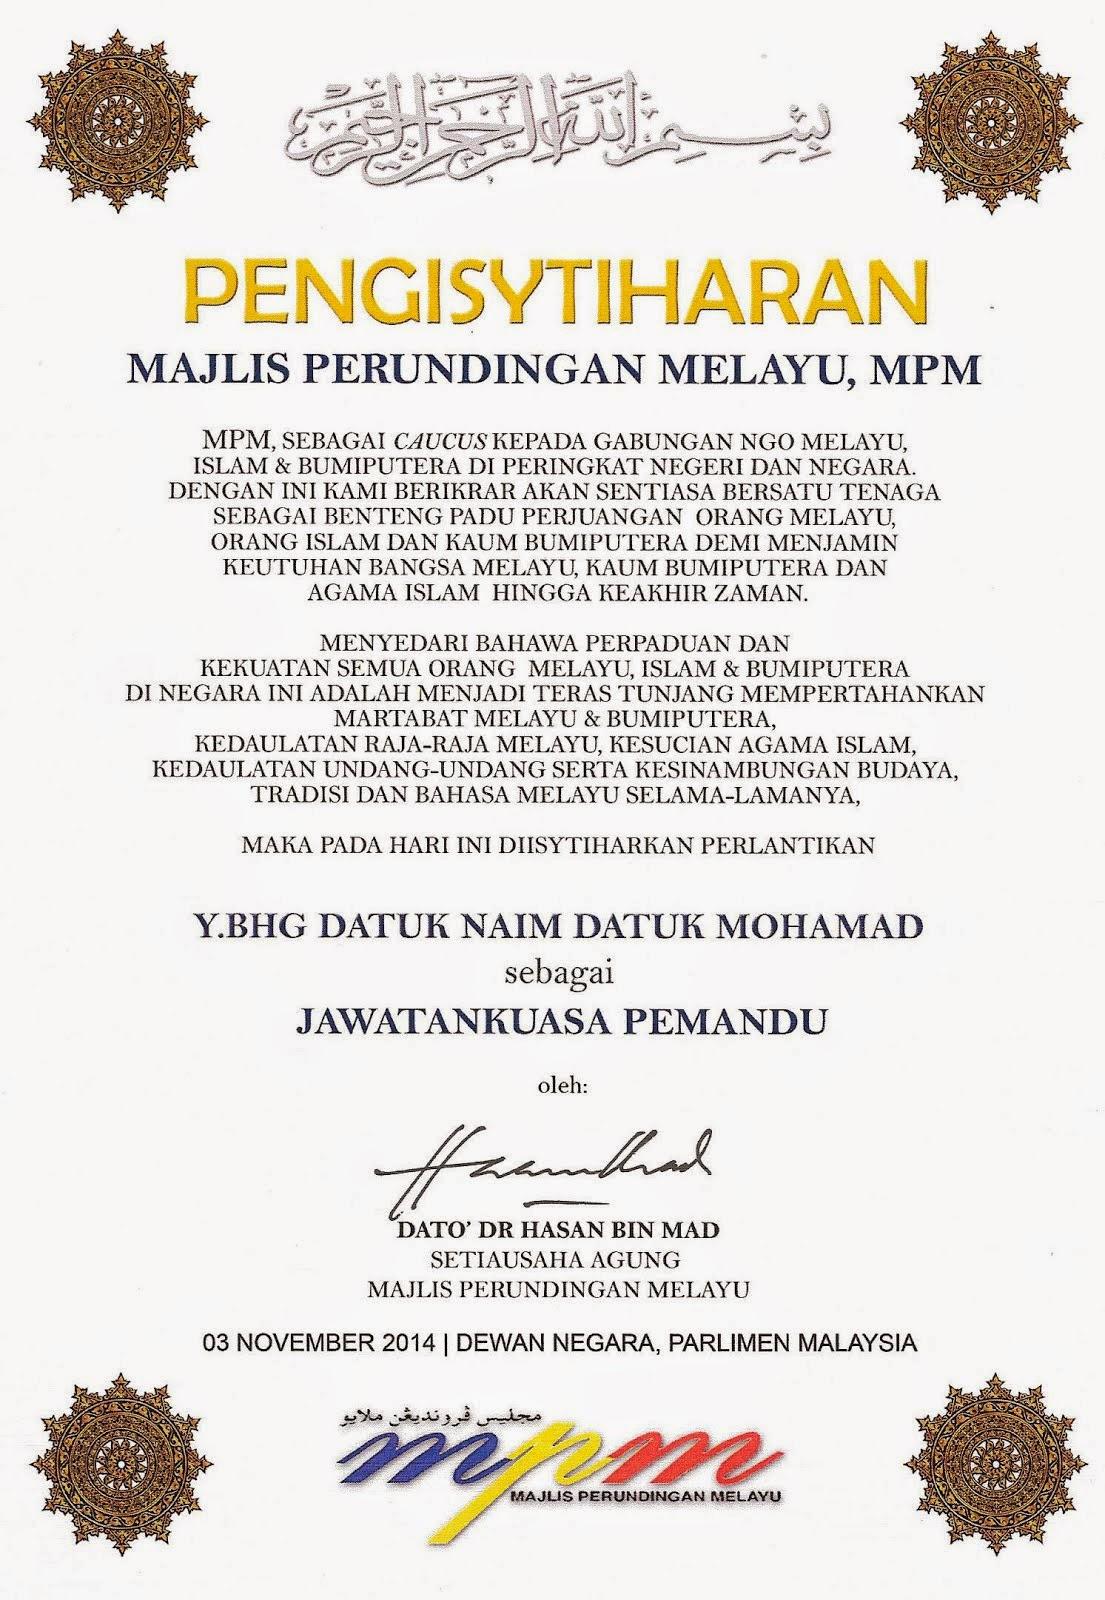 Majlis Perunding Melayu (MPM)